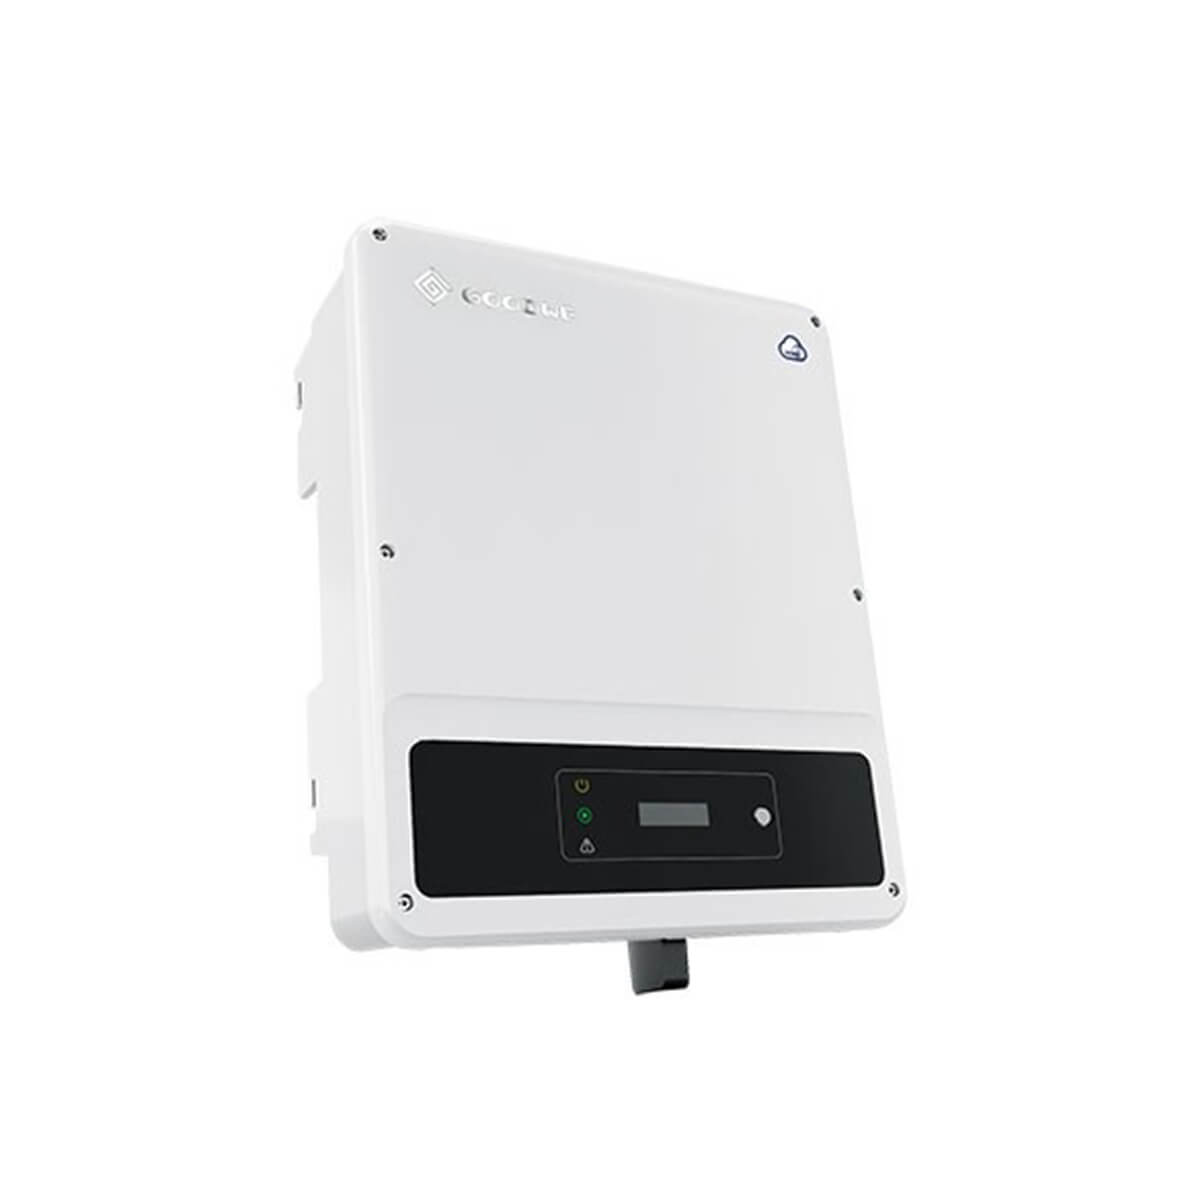 goodwe 3.6kW inverter, goodwe gw3600d-ns 3.6kW inverter, goodwe gw3600d-ns inverter, goodwe gw3600d-ns, goodwe 3.6 kW, GOODWE 3.6 KW